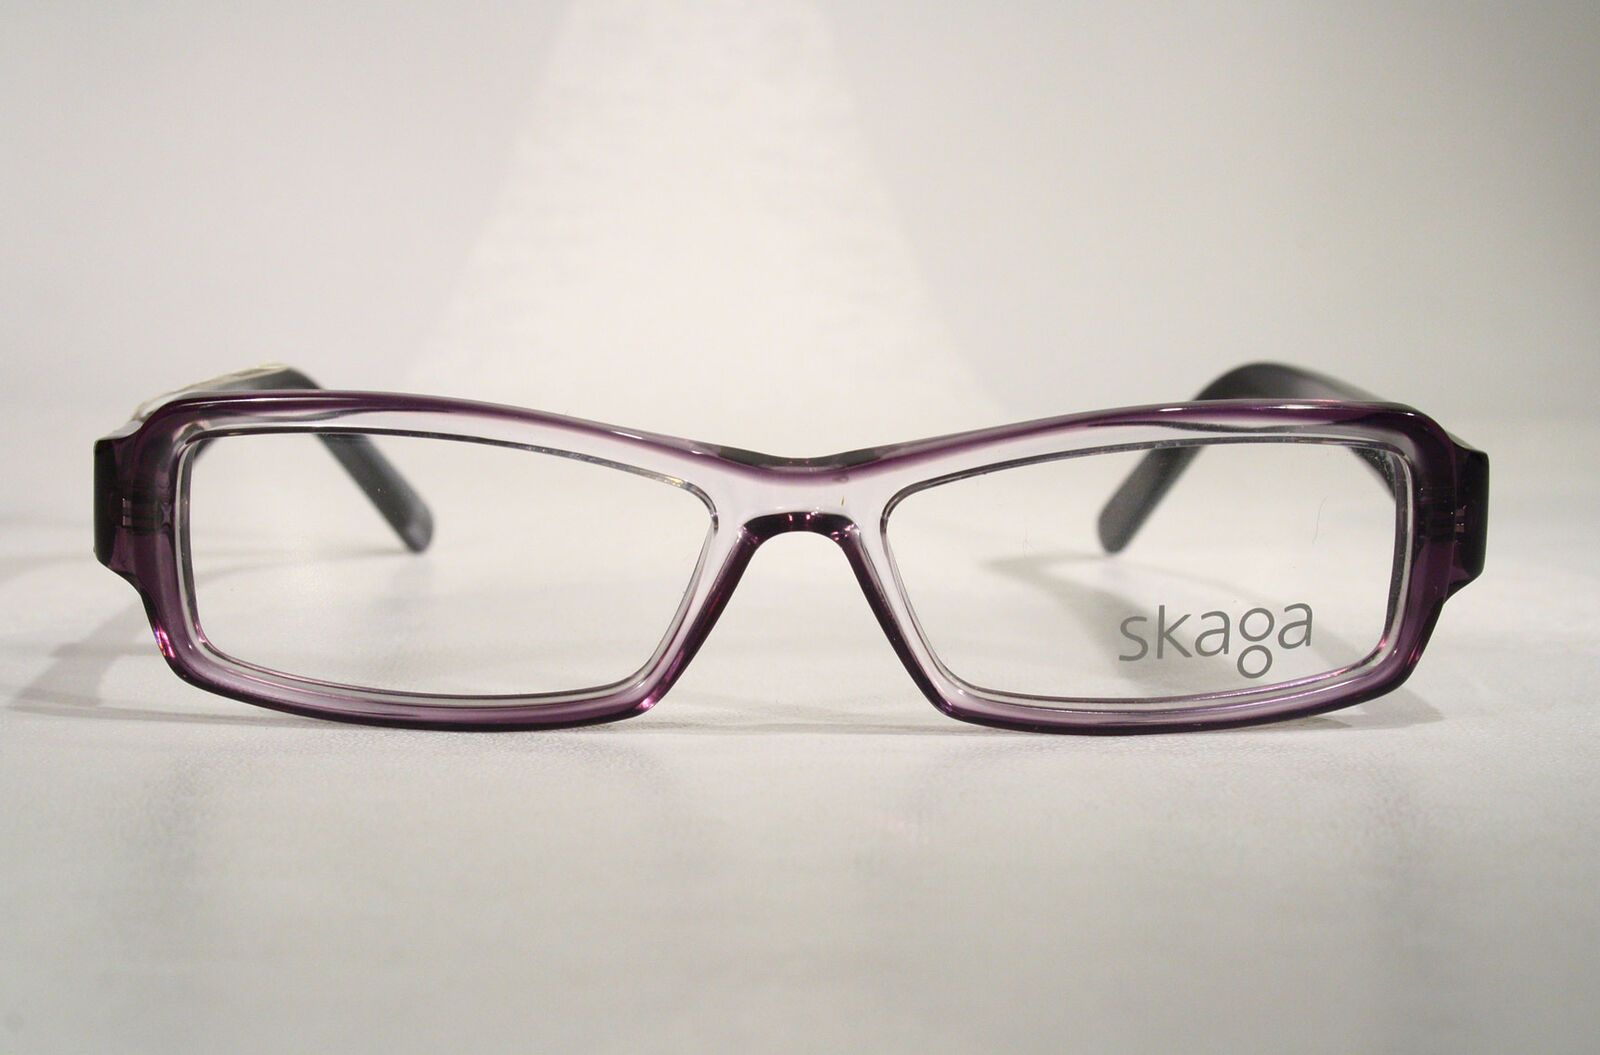 af8a2000cd Women s Slim Small SKAGA Scandinavian Clear Purple Gray Eyeglass Frames  Glasses   eBay (RipVanW)